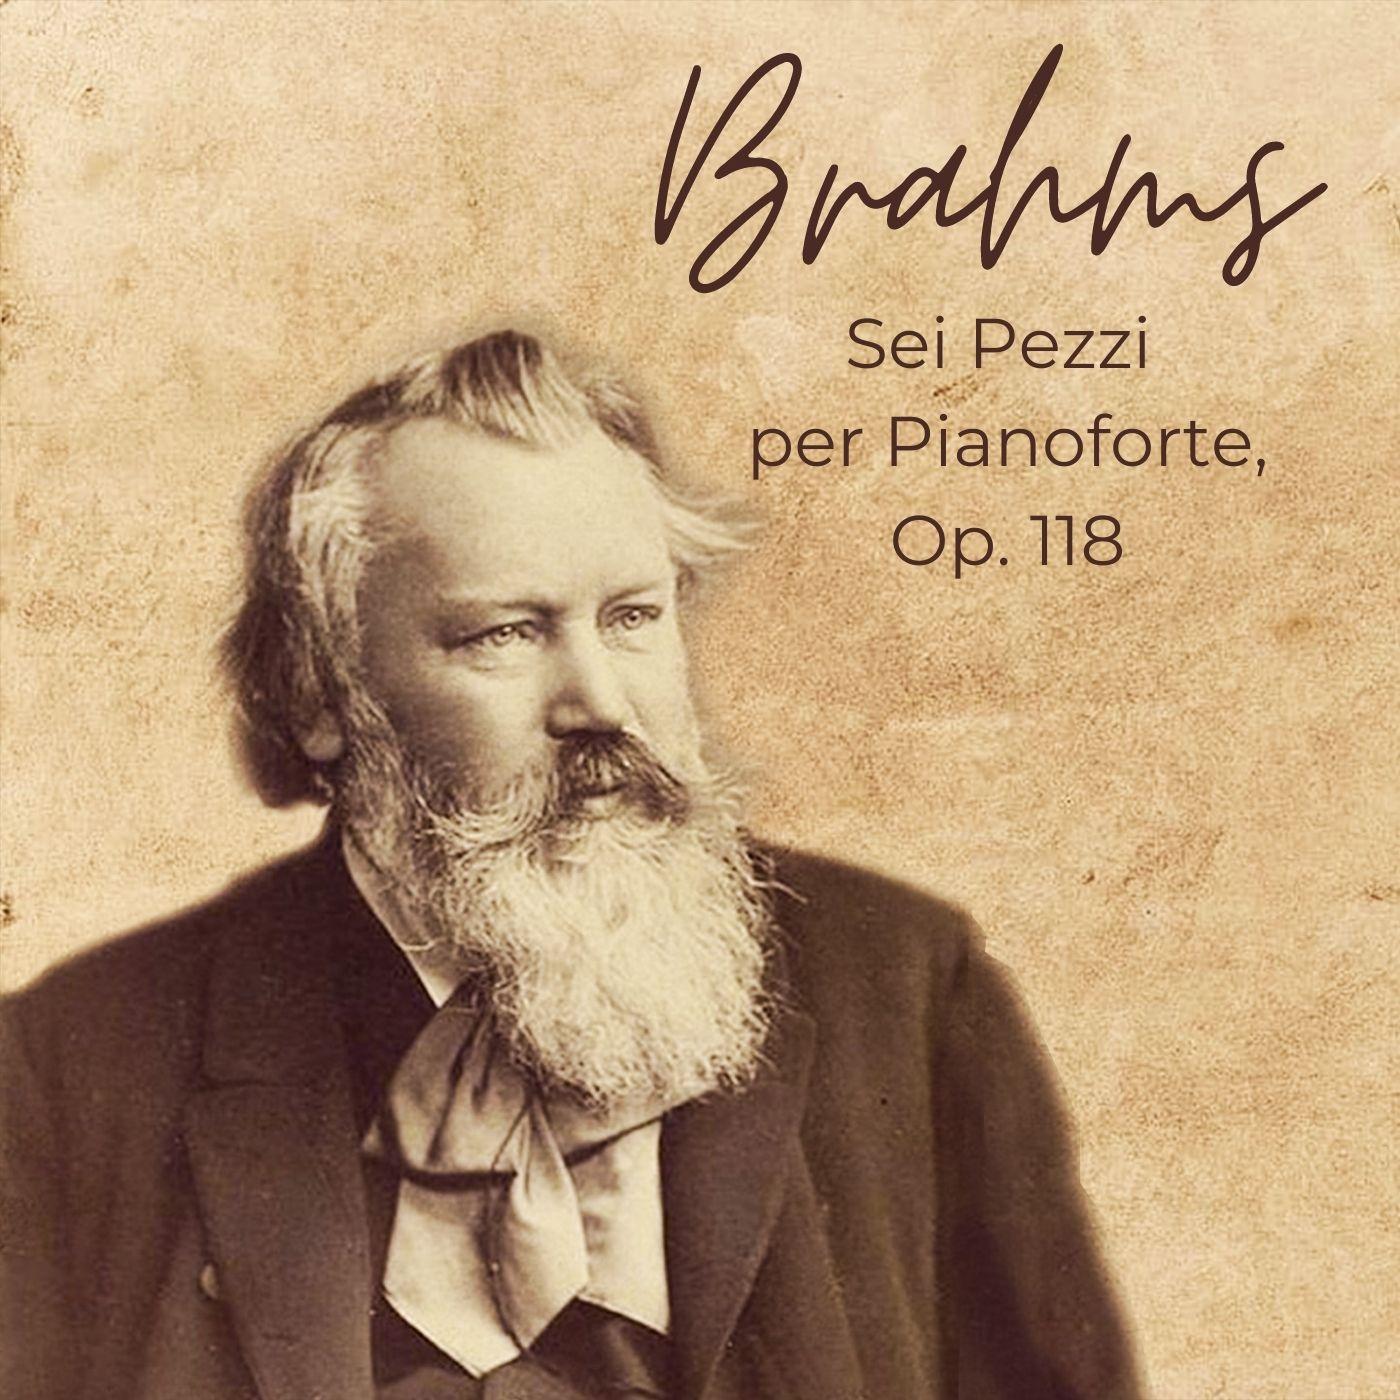 Brahms: Sei pezzi per pianoforte, Op. 118